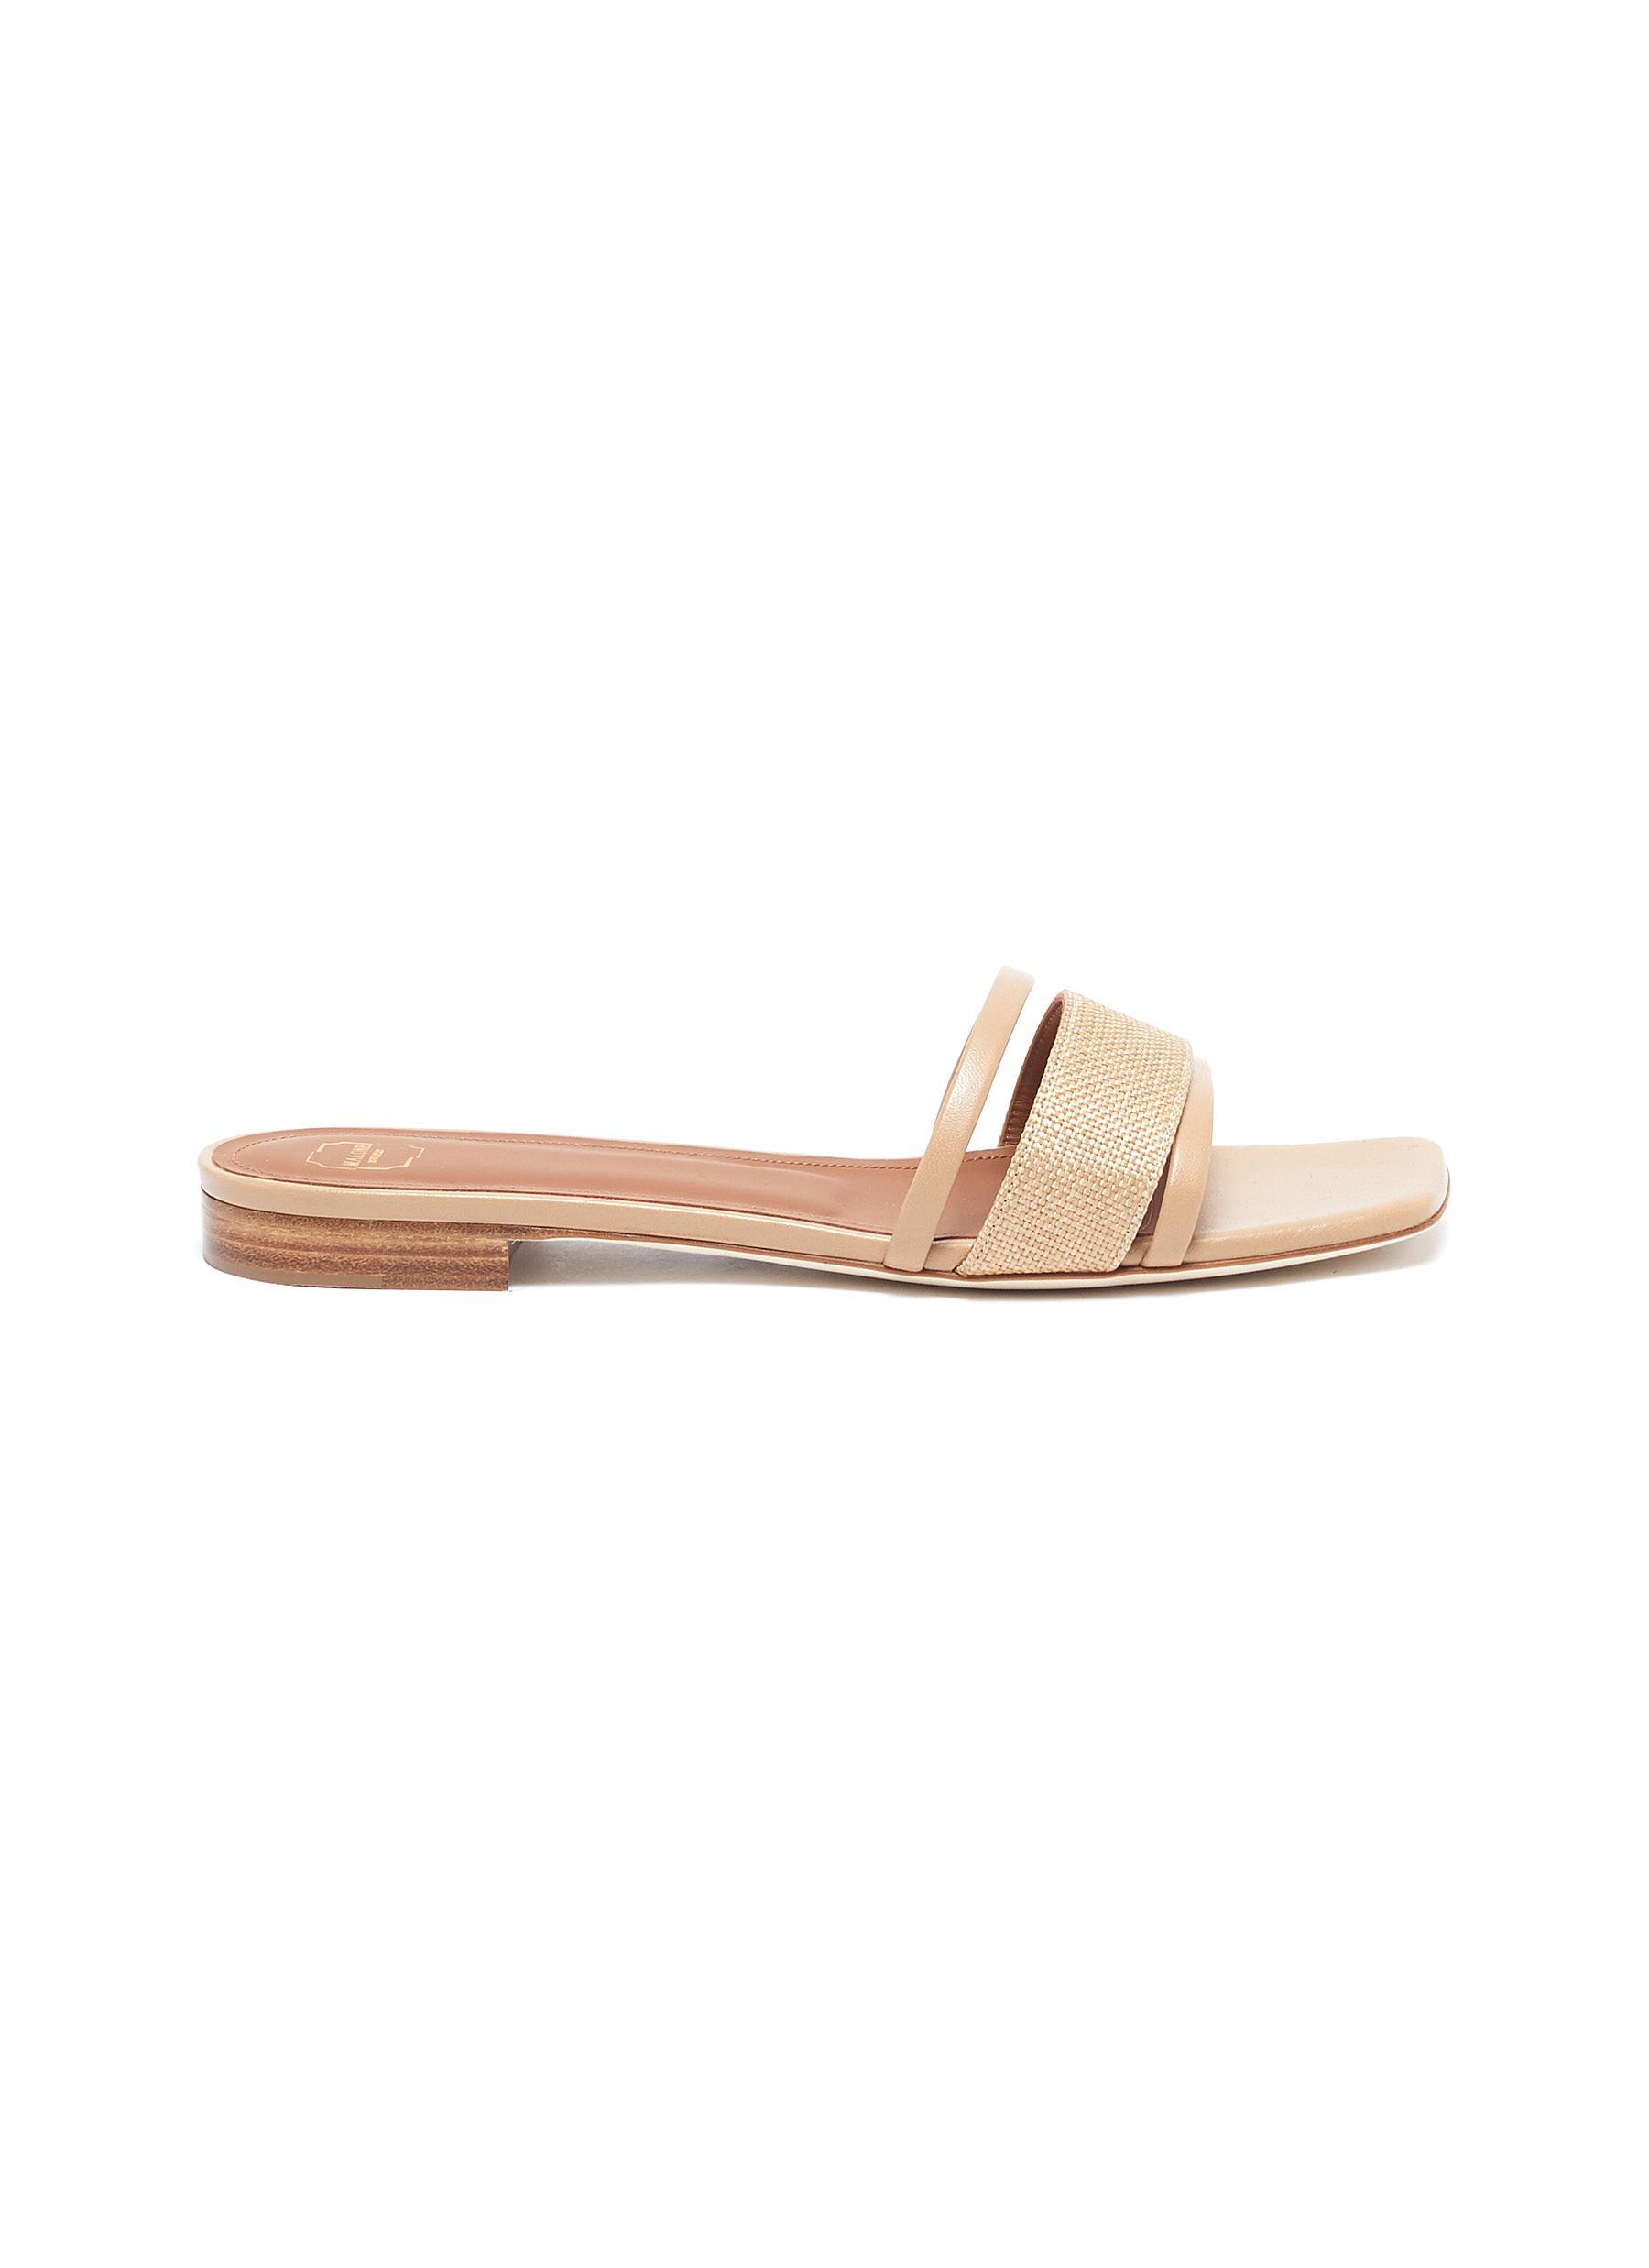 Malone Souliers Flats Demi raffia leather sandals